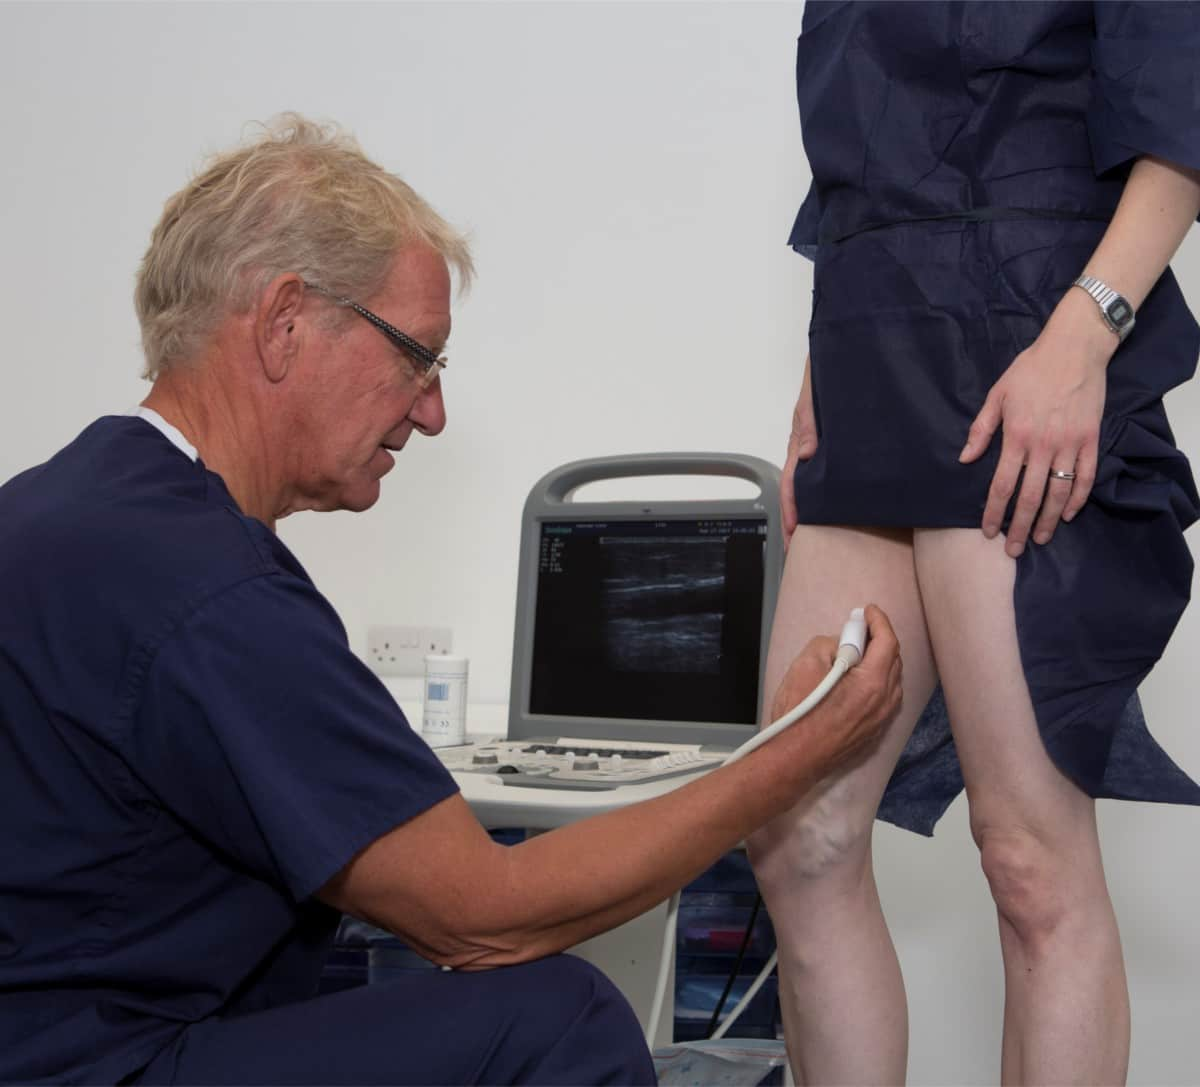 Varicose veins consultation at Veincentre